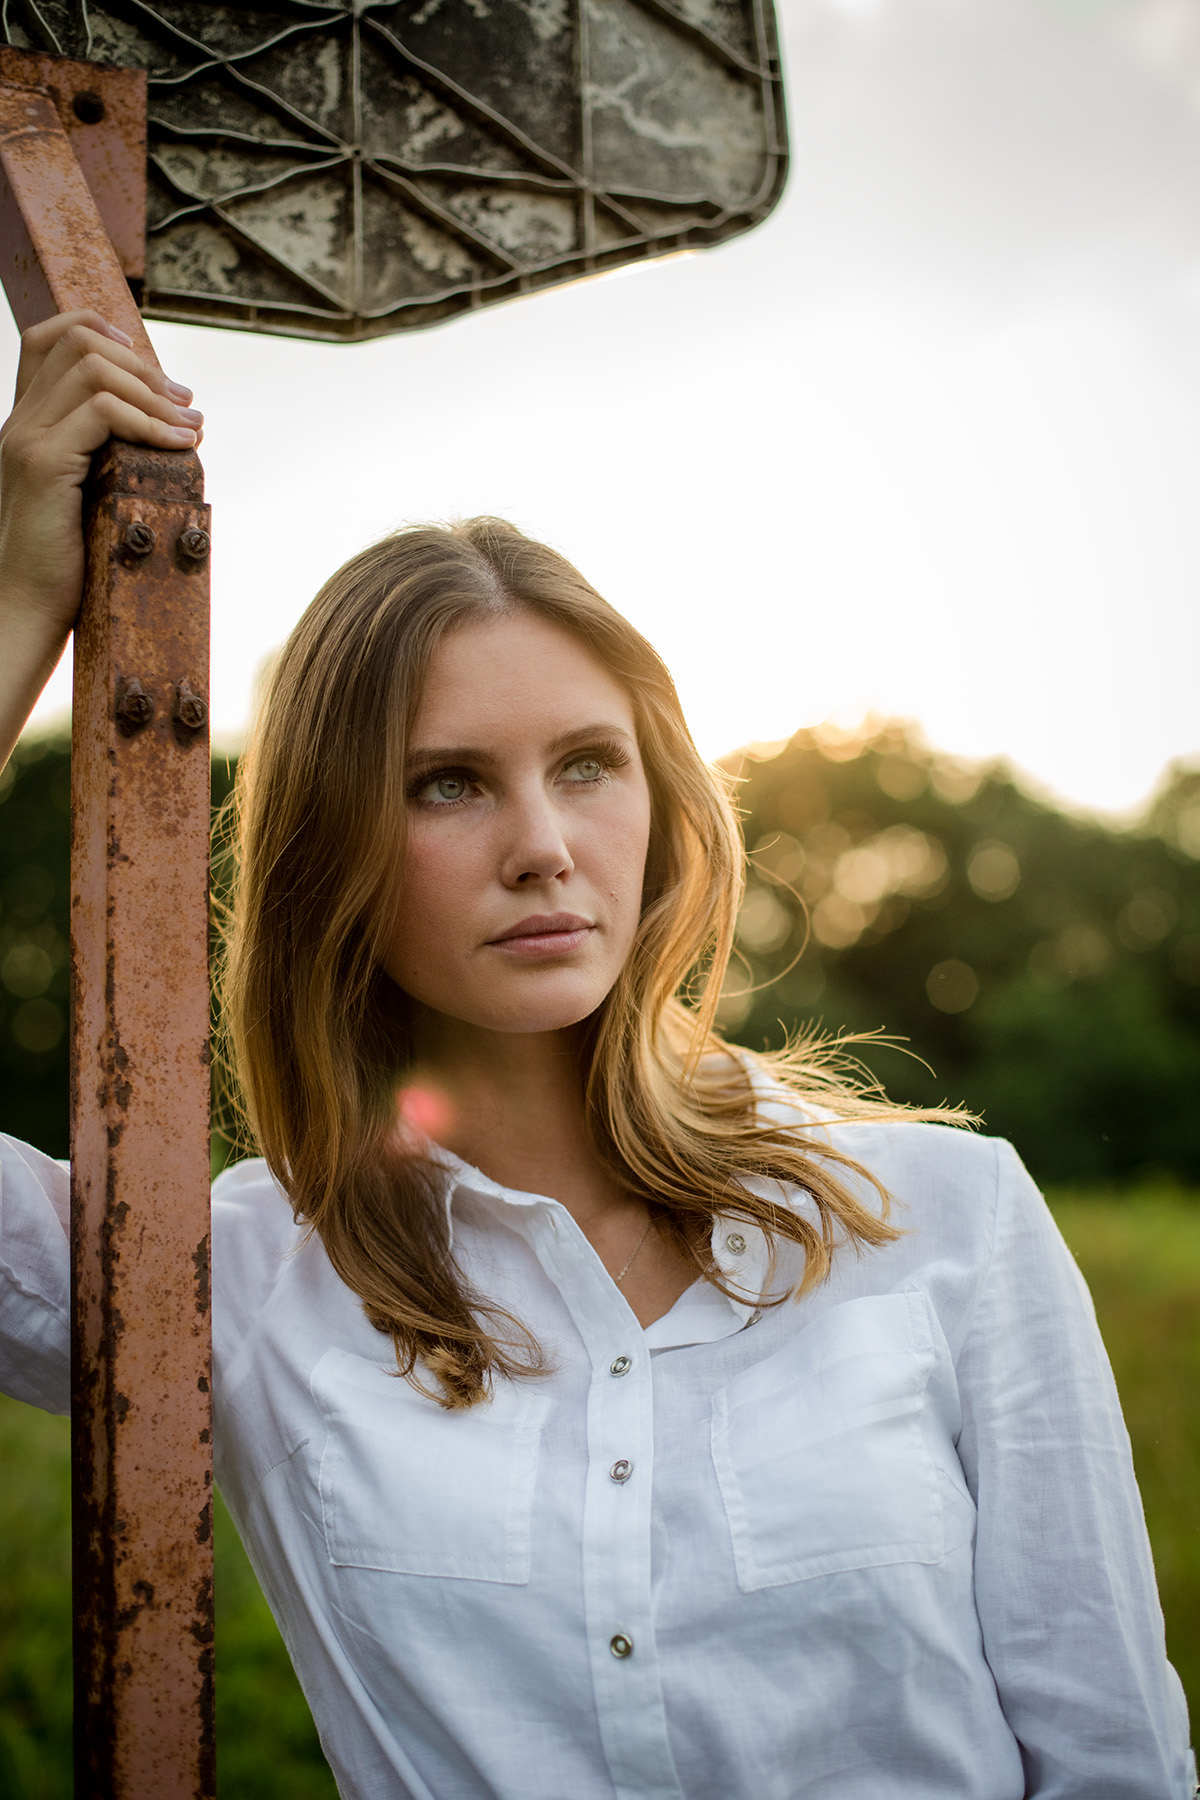 Beautyshooting; Beauty; Portrait; Sommer; Sunset; Fashion